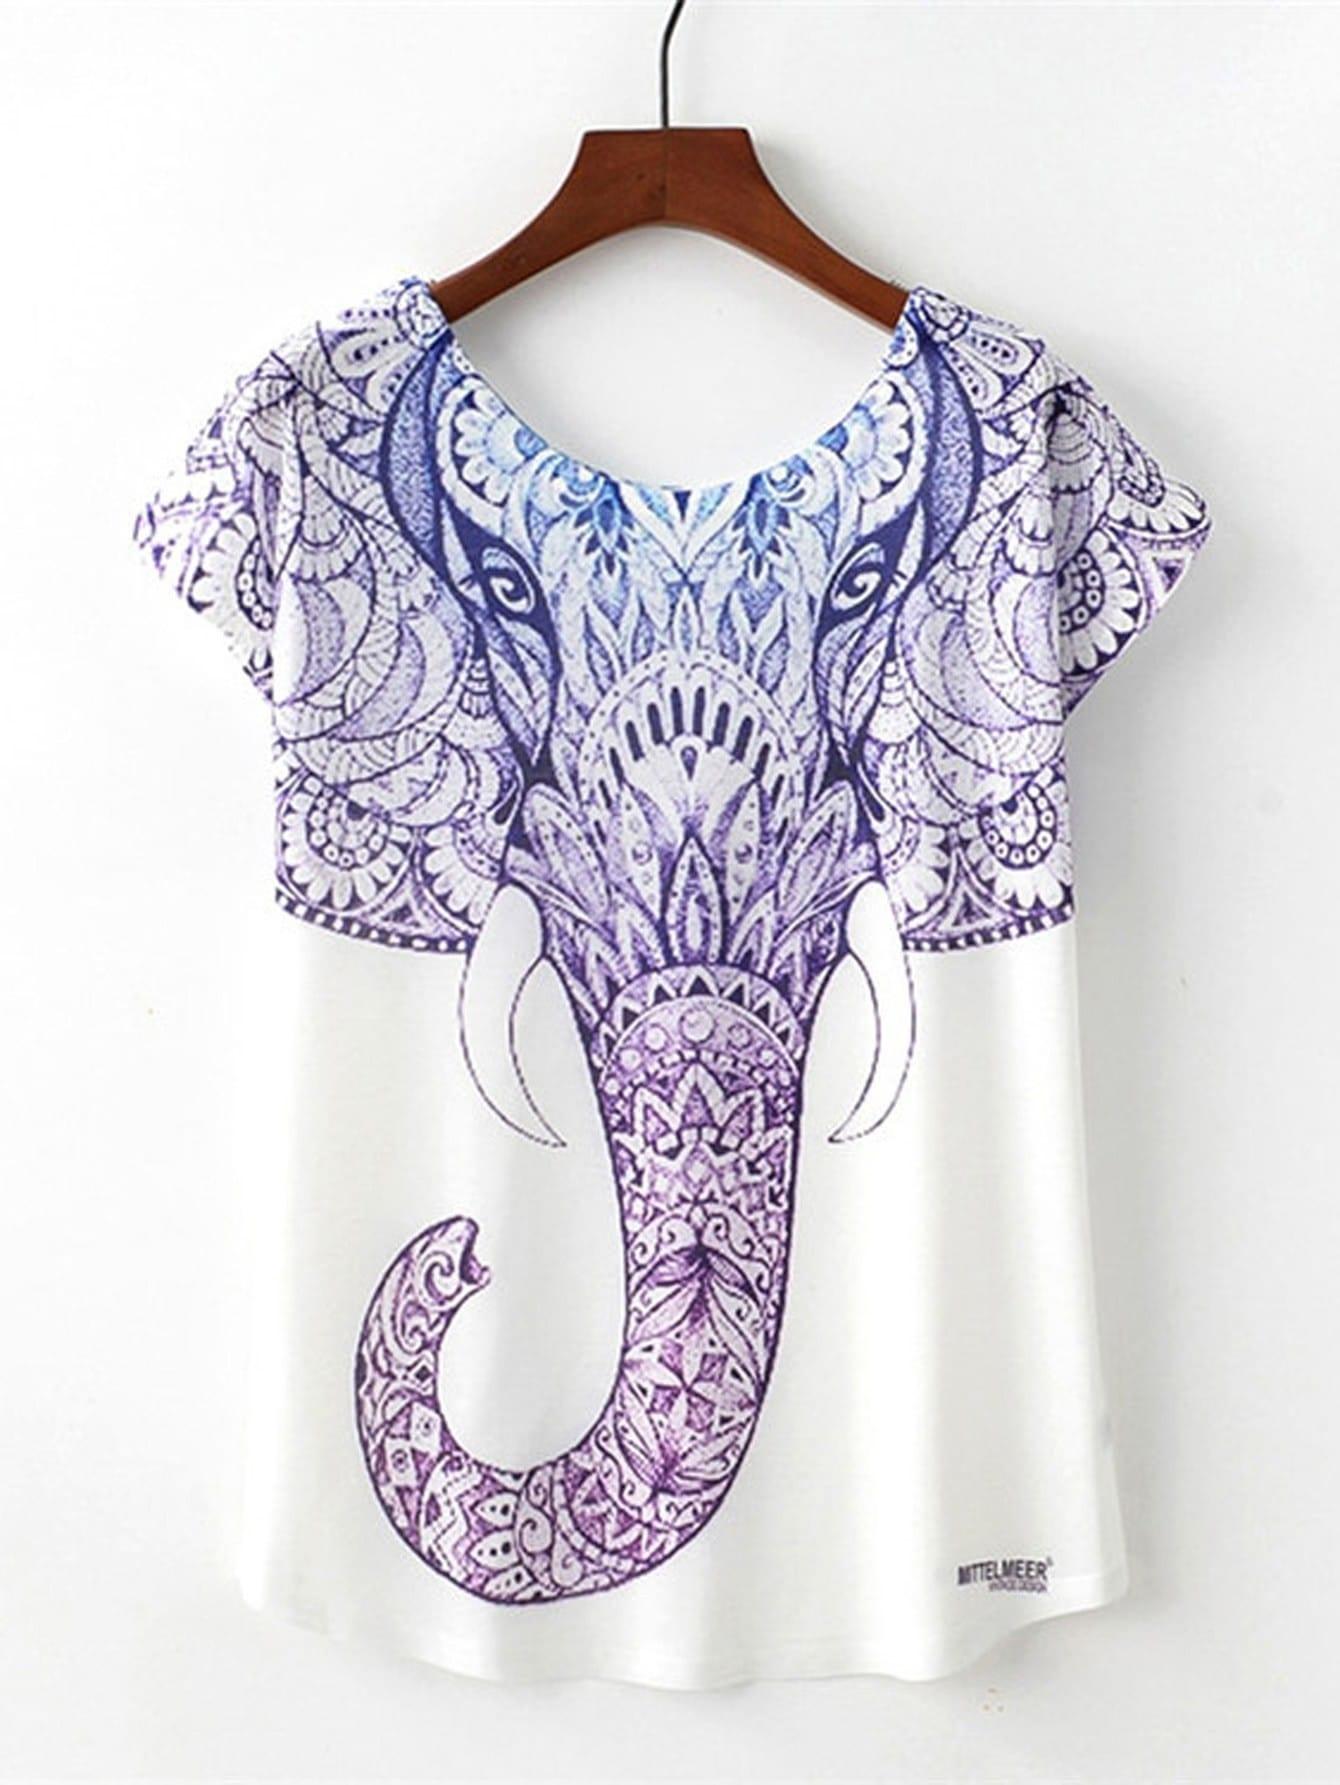 Ornate Elephant Print T-shirt